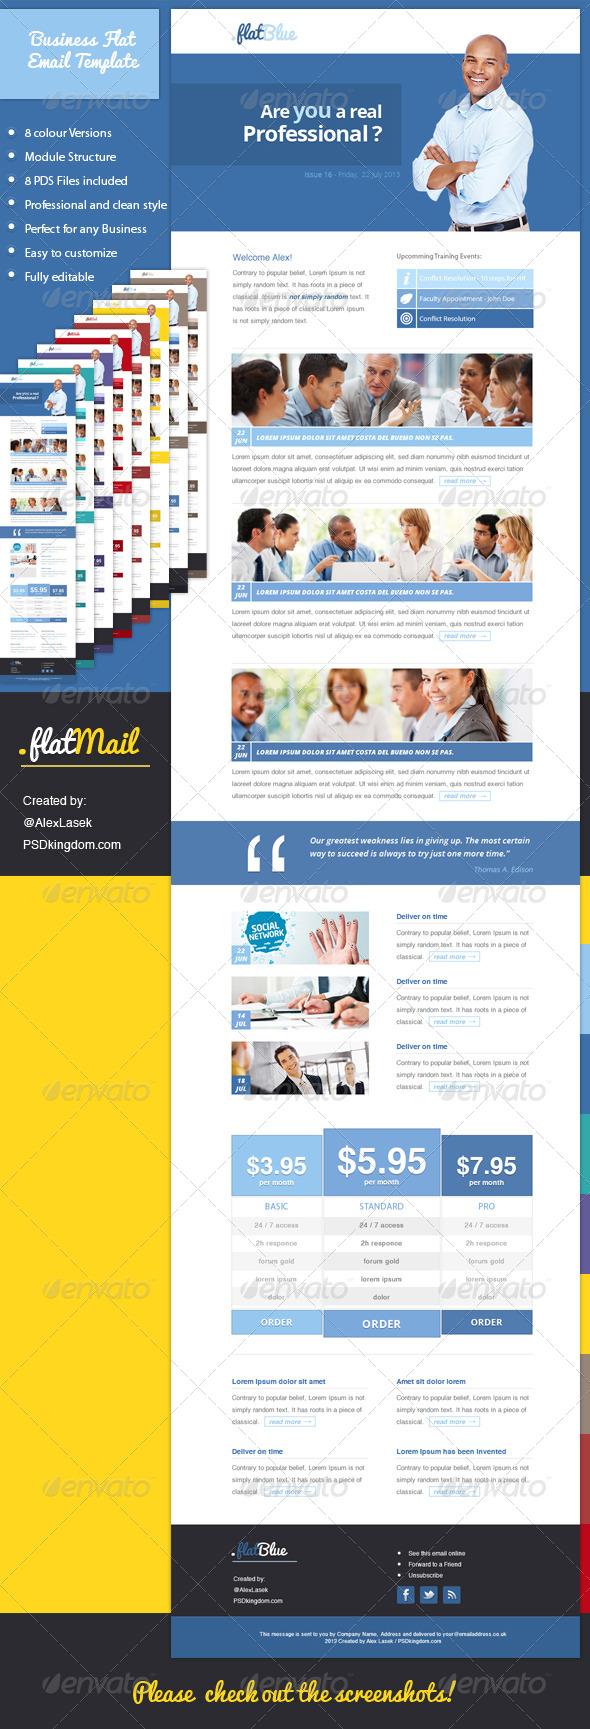 Flat eNewsletter Design Templates - 8 colors - E-newsletters Web Elements